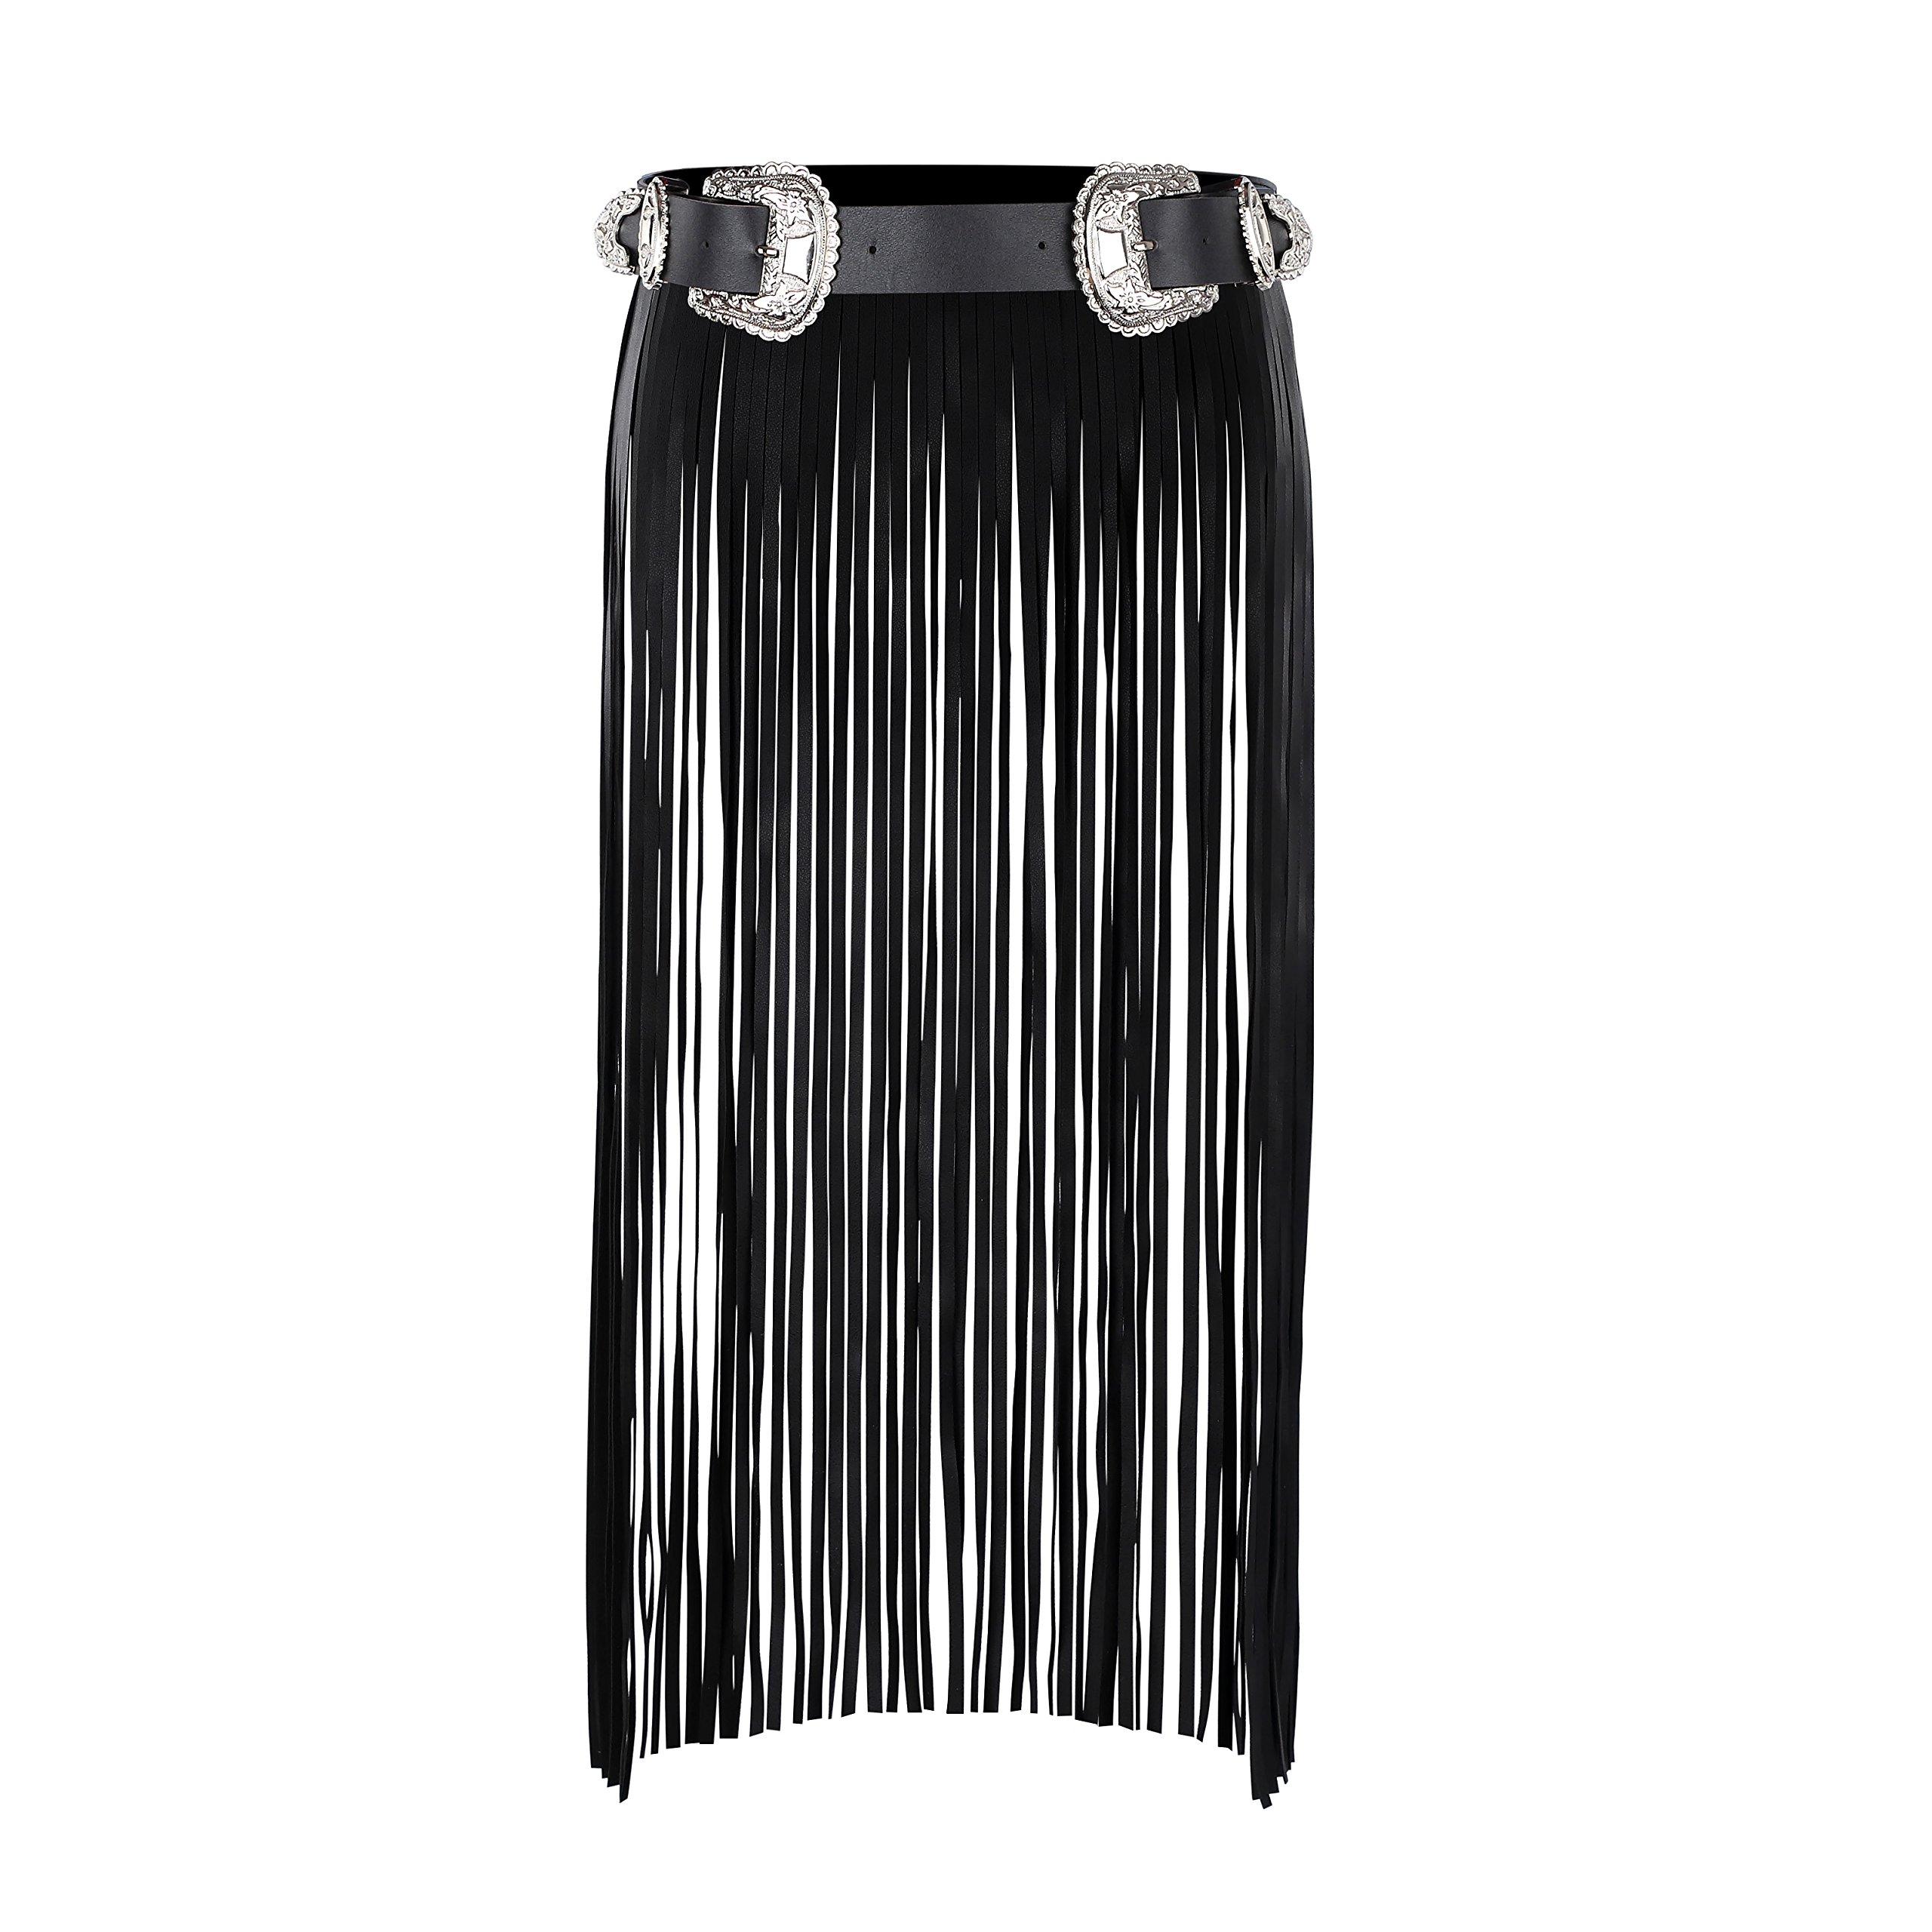 Wyenliz Women's Leather Skirt Belt Double buckles Tassel Gothic Waist Belt